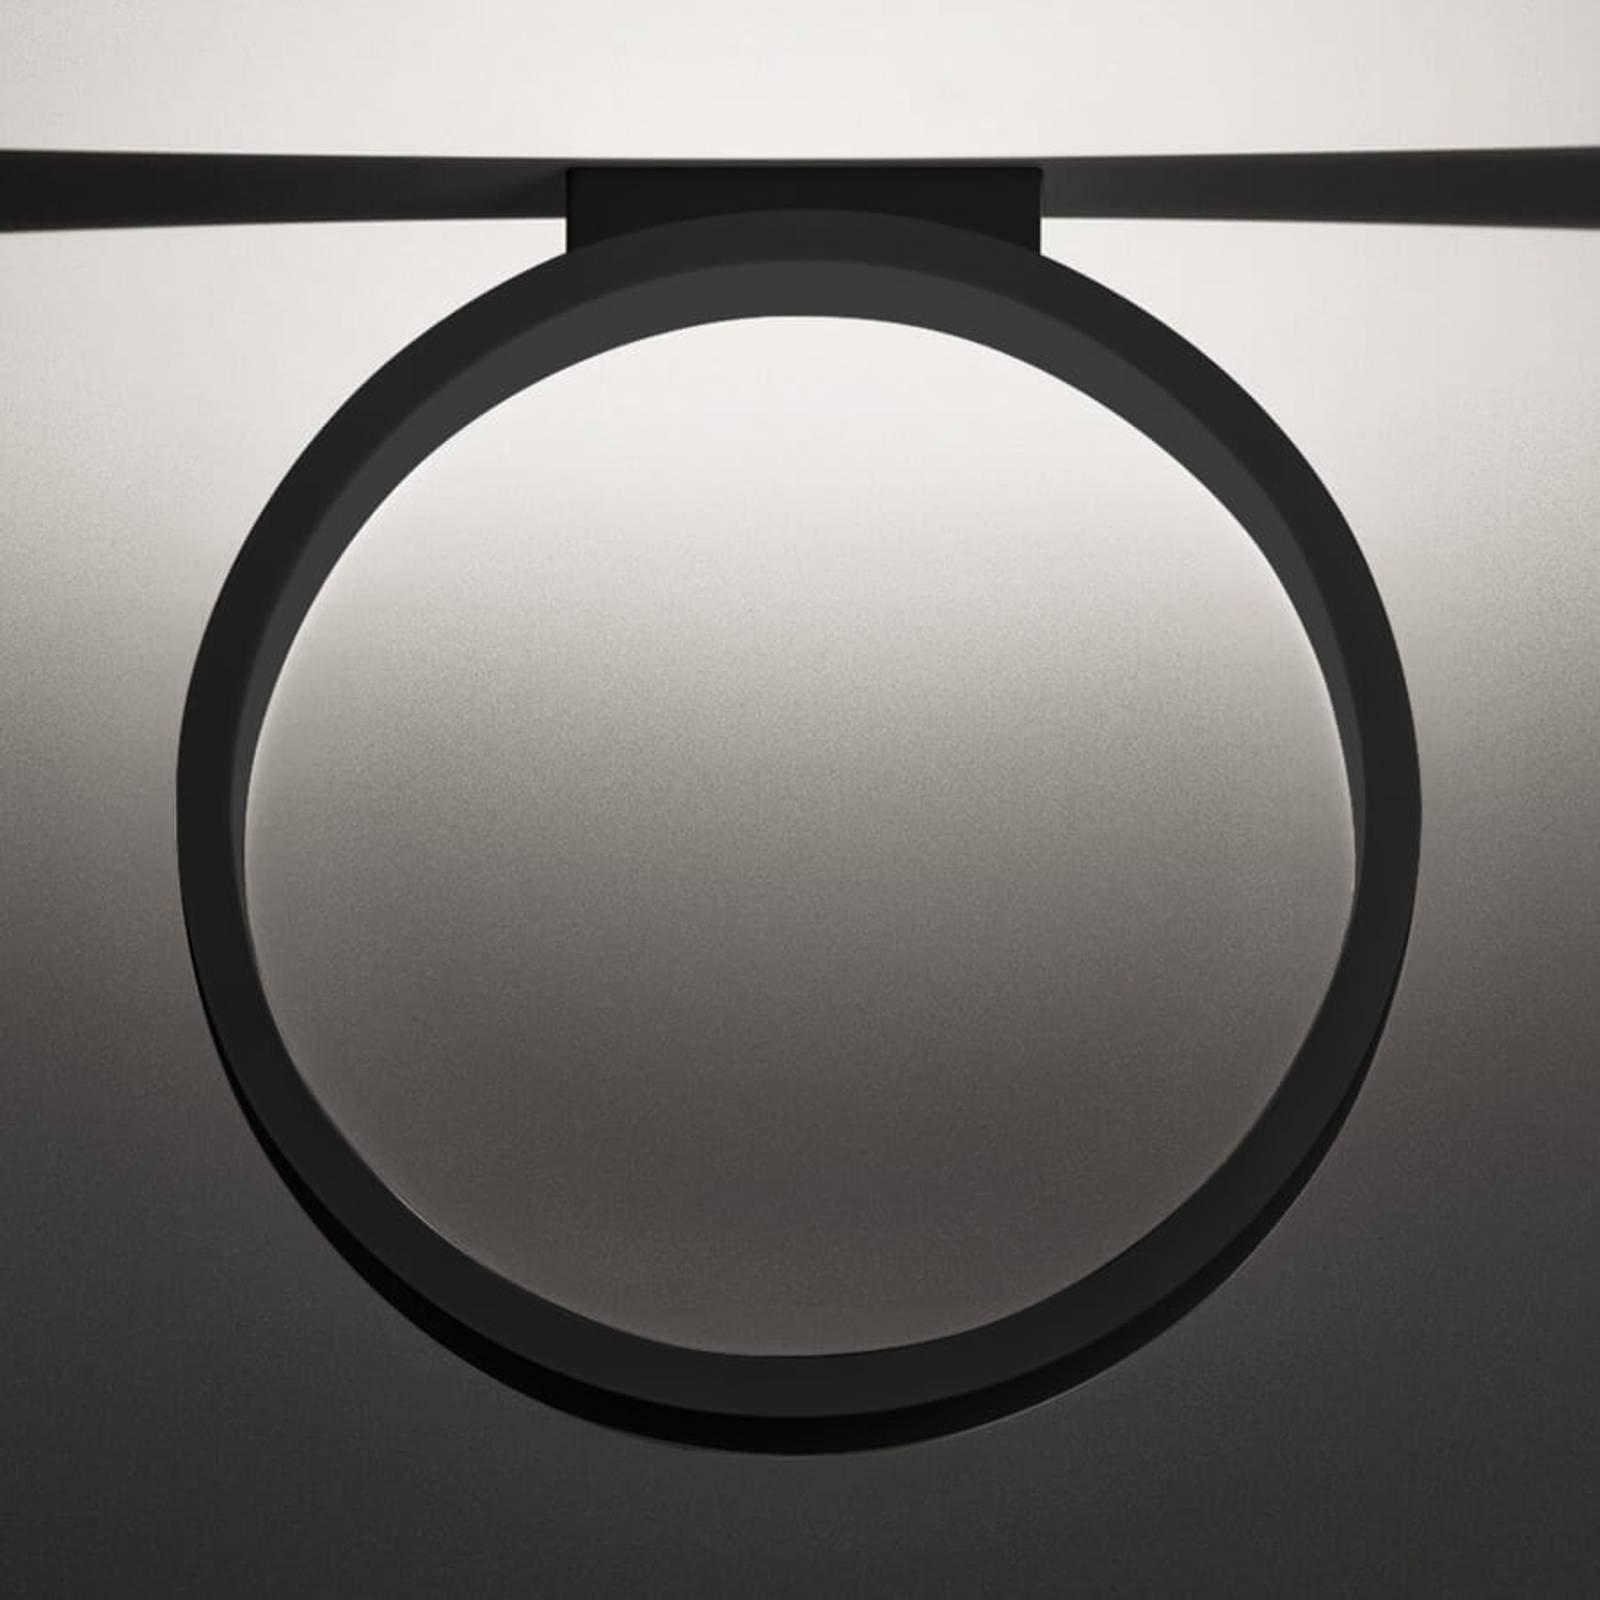 Cini&Nils Assolo - LED-taklampe, svart, 43 cm